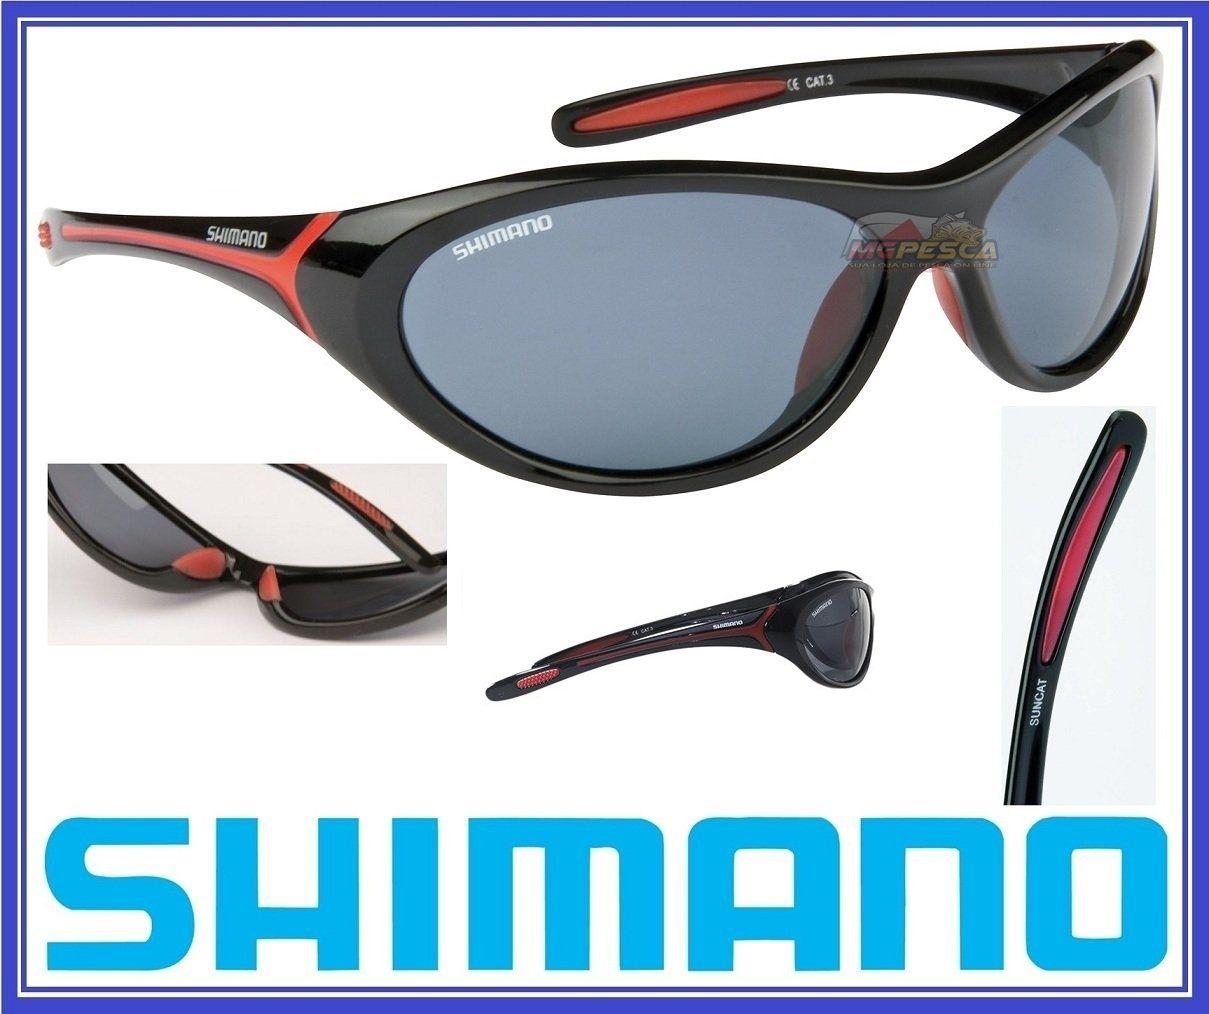 Óculos Shimano Polarizado Sunglass Catana - Suncat  - MGPesca